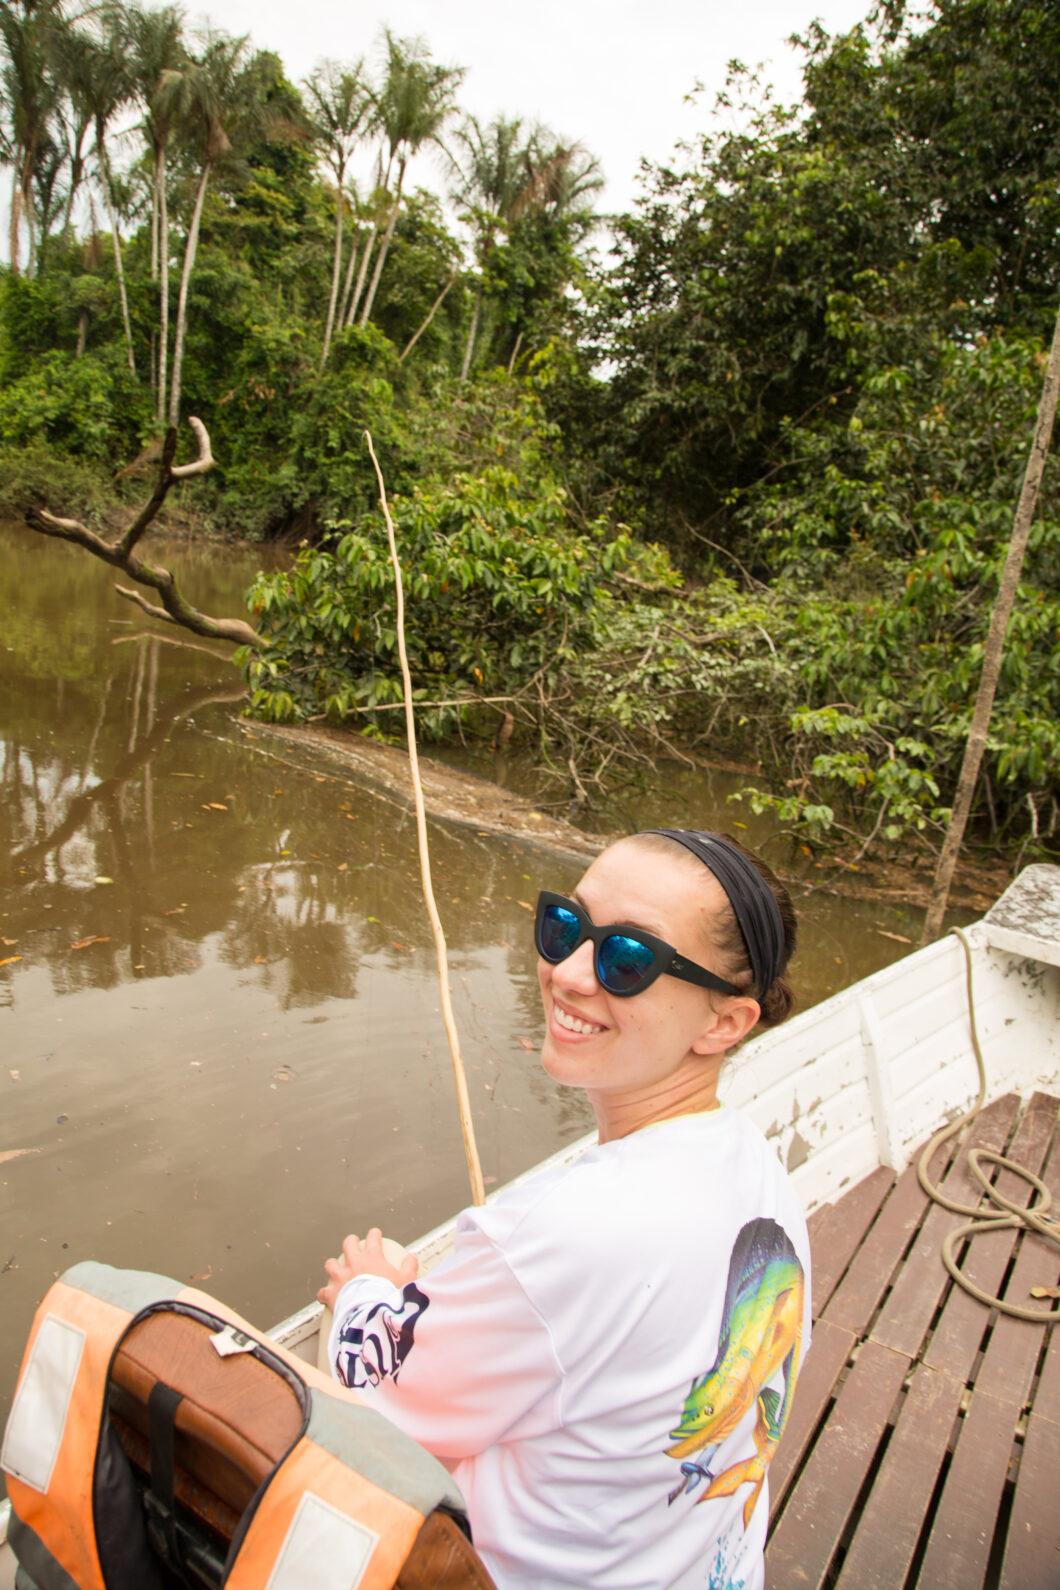 Fishing in the Amazon Rainforest